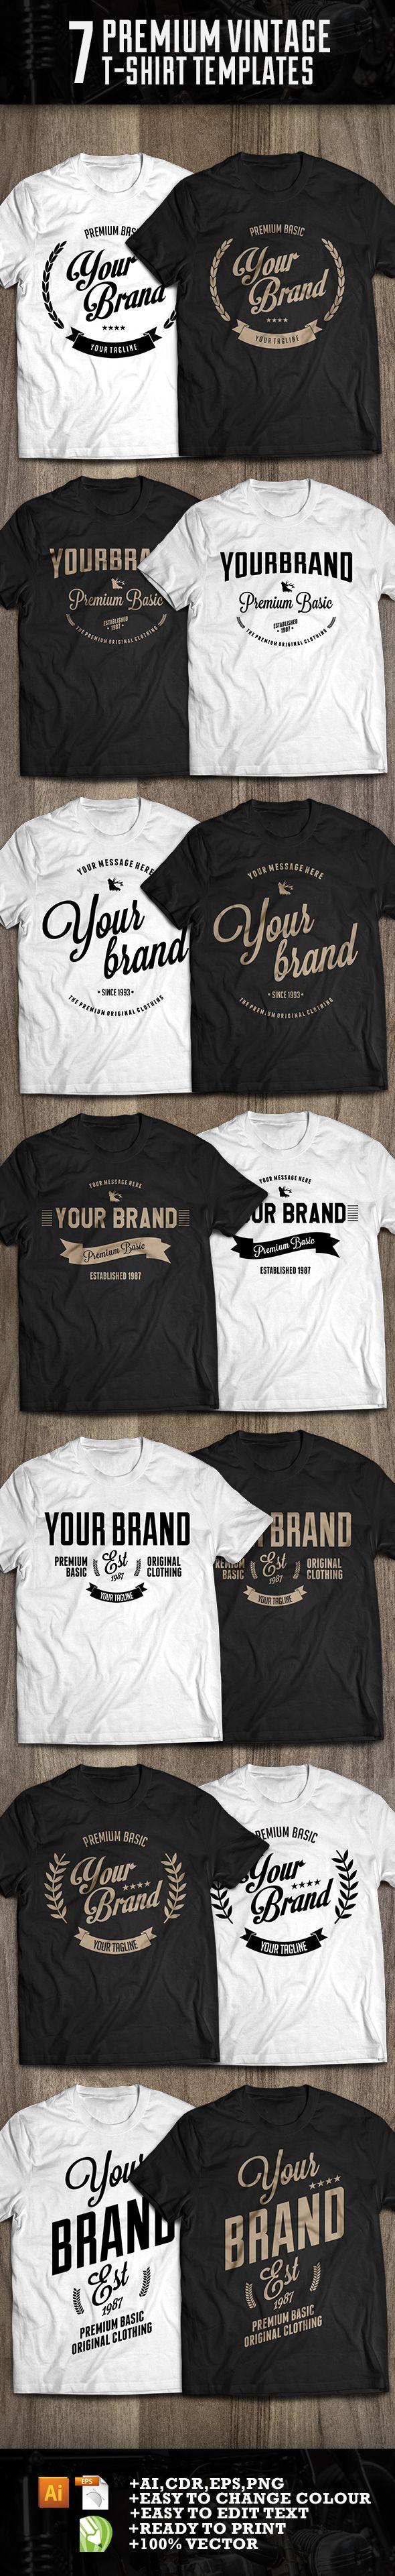 7 premium t-shirt template on Behance